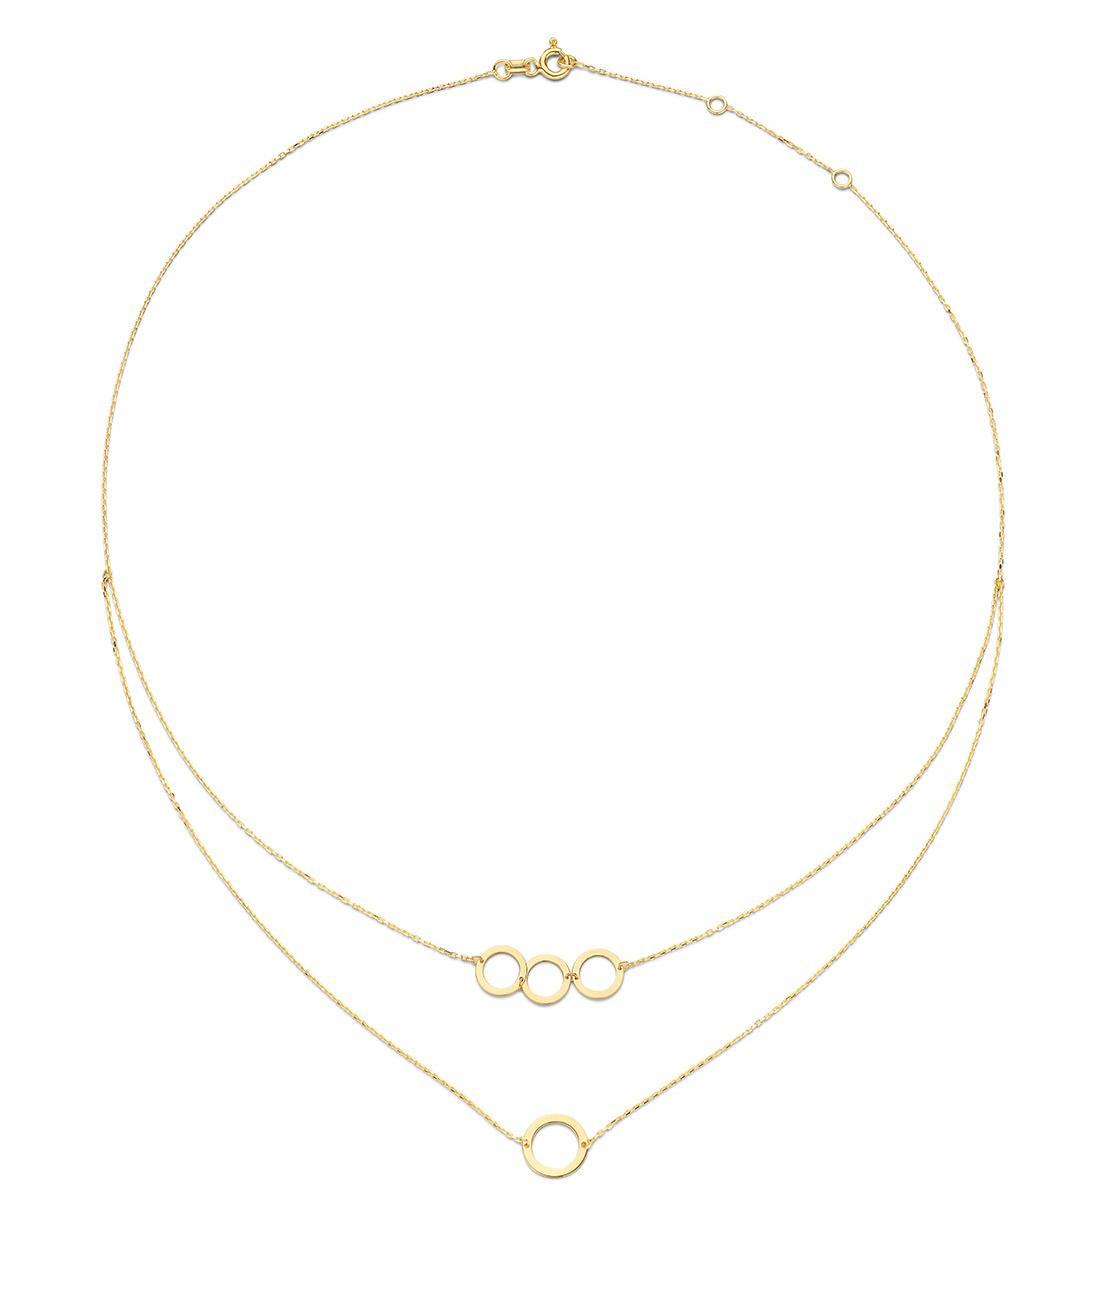 14 karaat geelgouden dames ketting - Jackie - De Circles Necklace-1